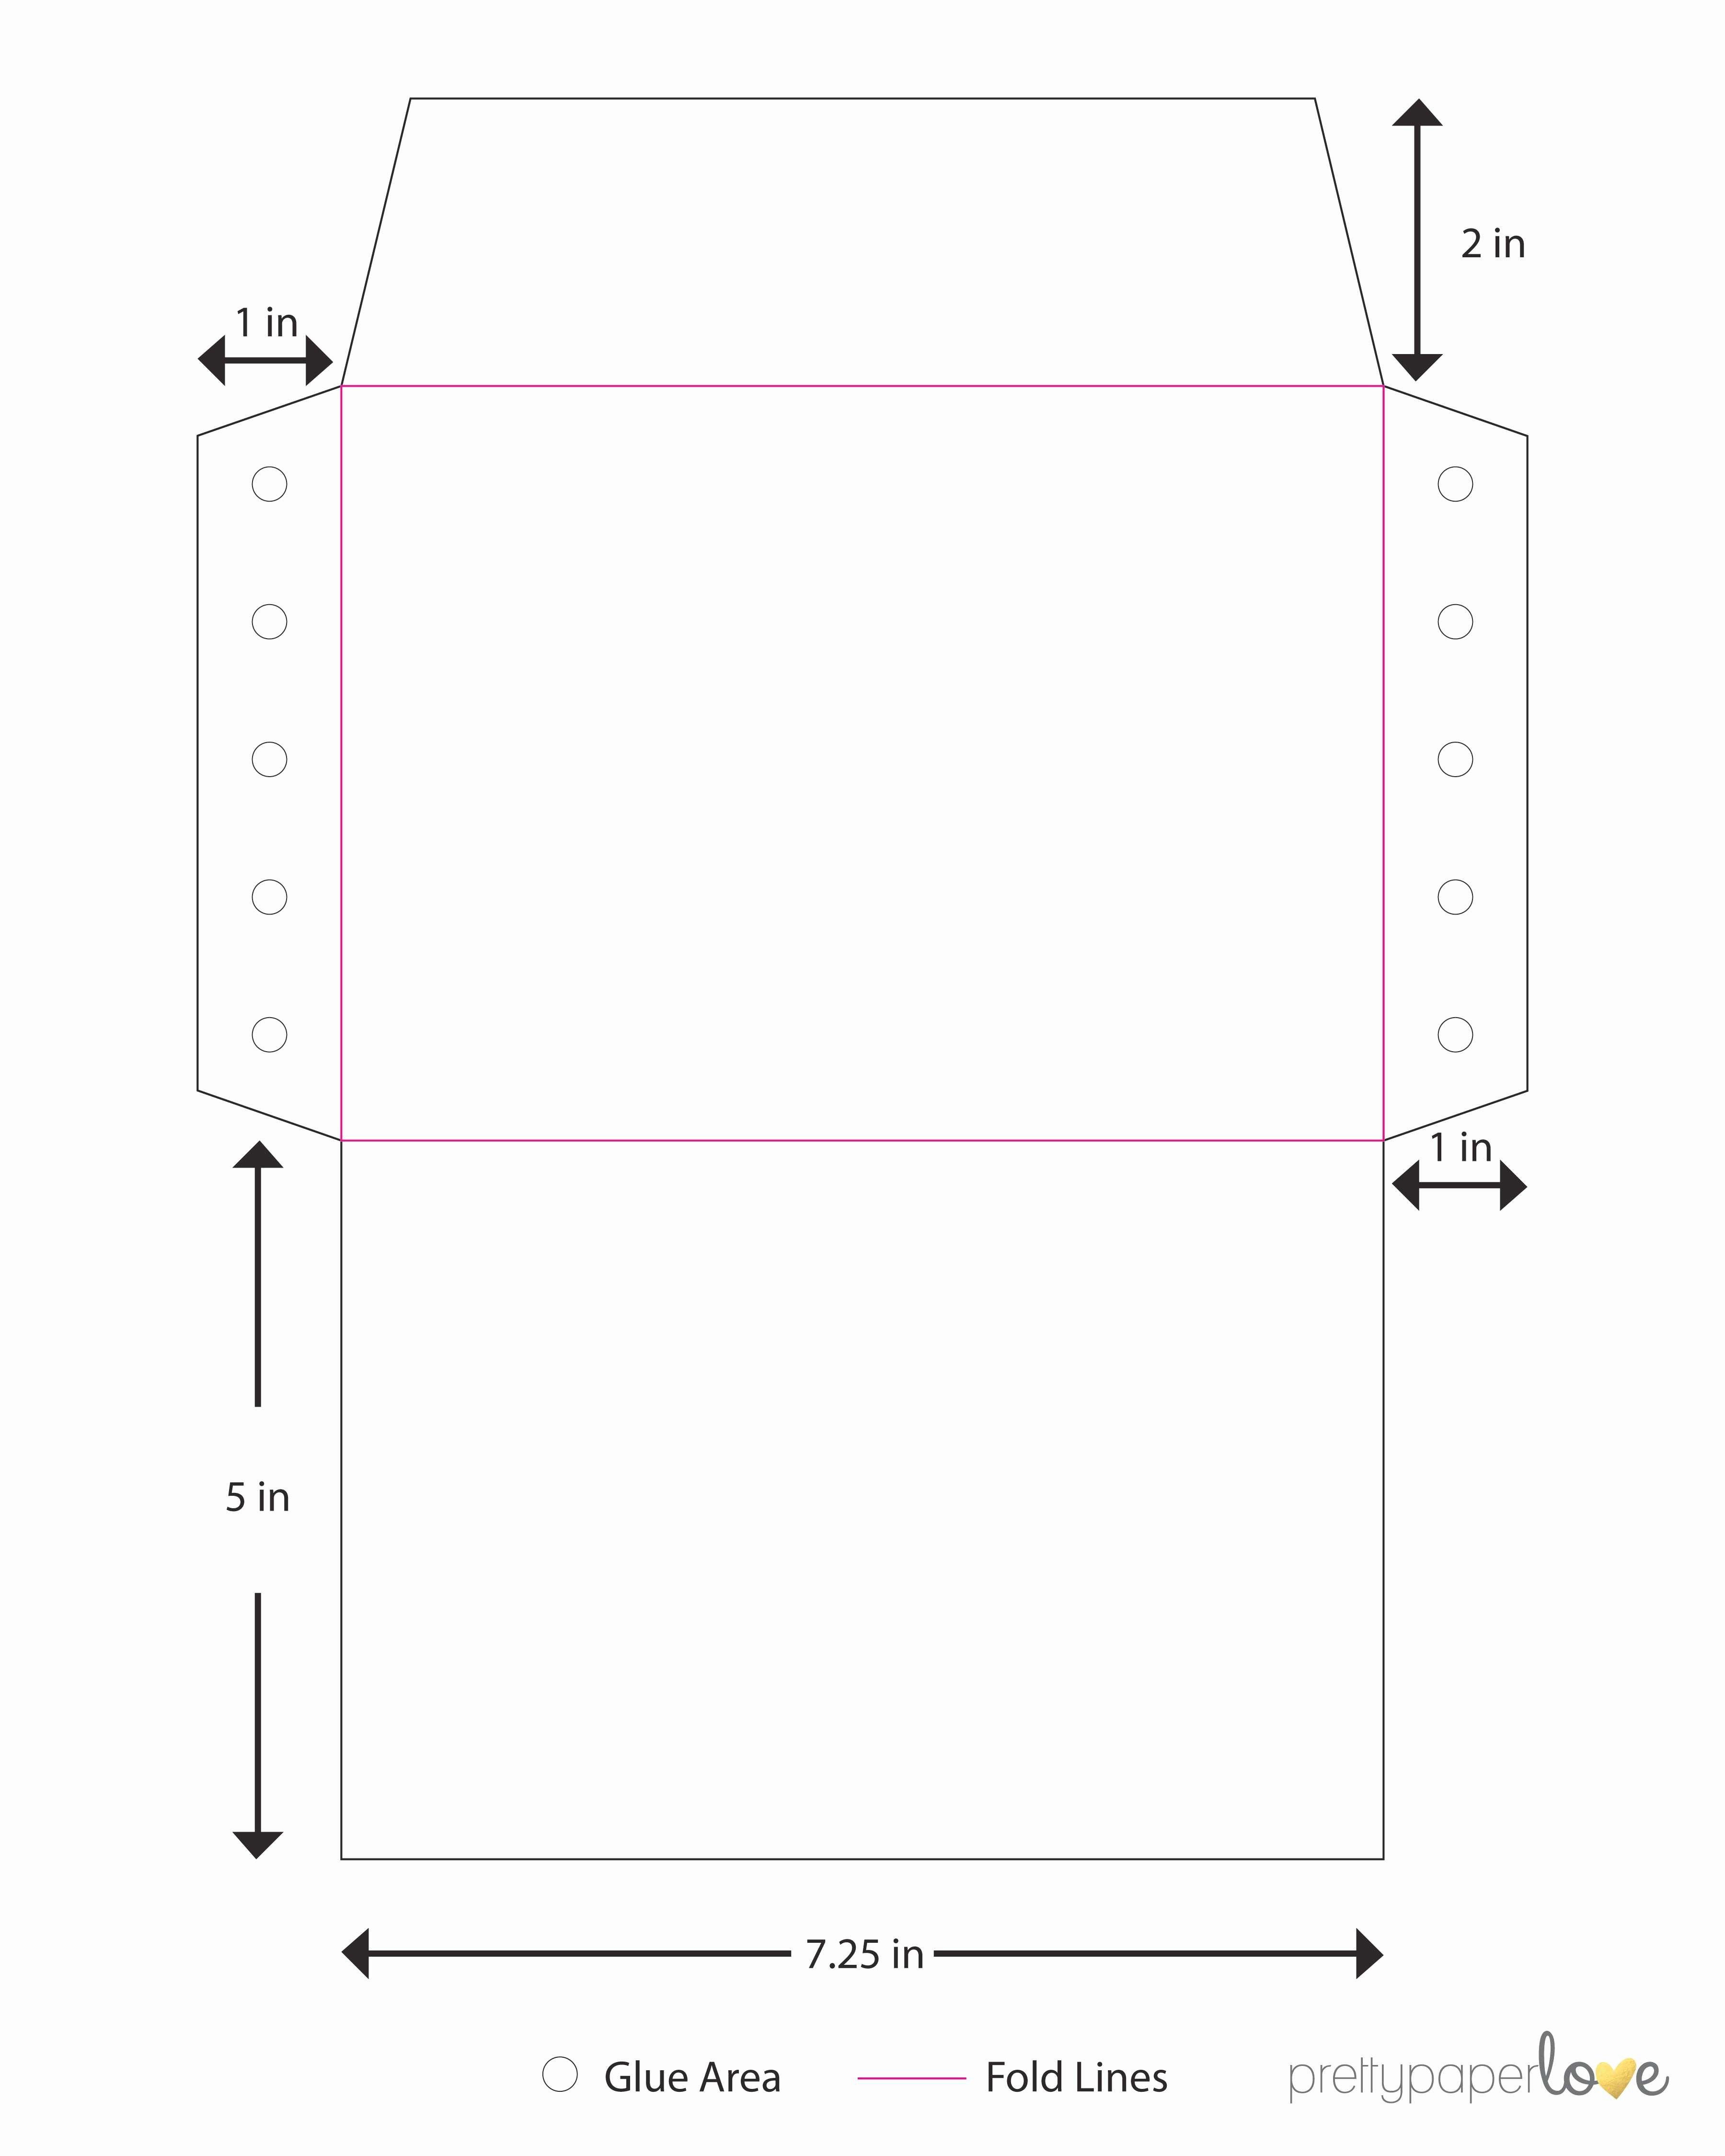 10 Envelope Template Illustrator Beautiful Luxury 9x12 Envelope Template Illustrator